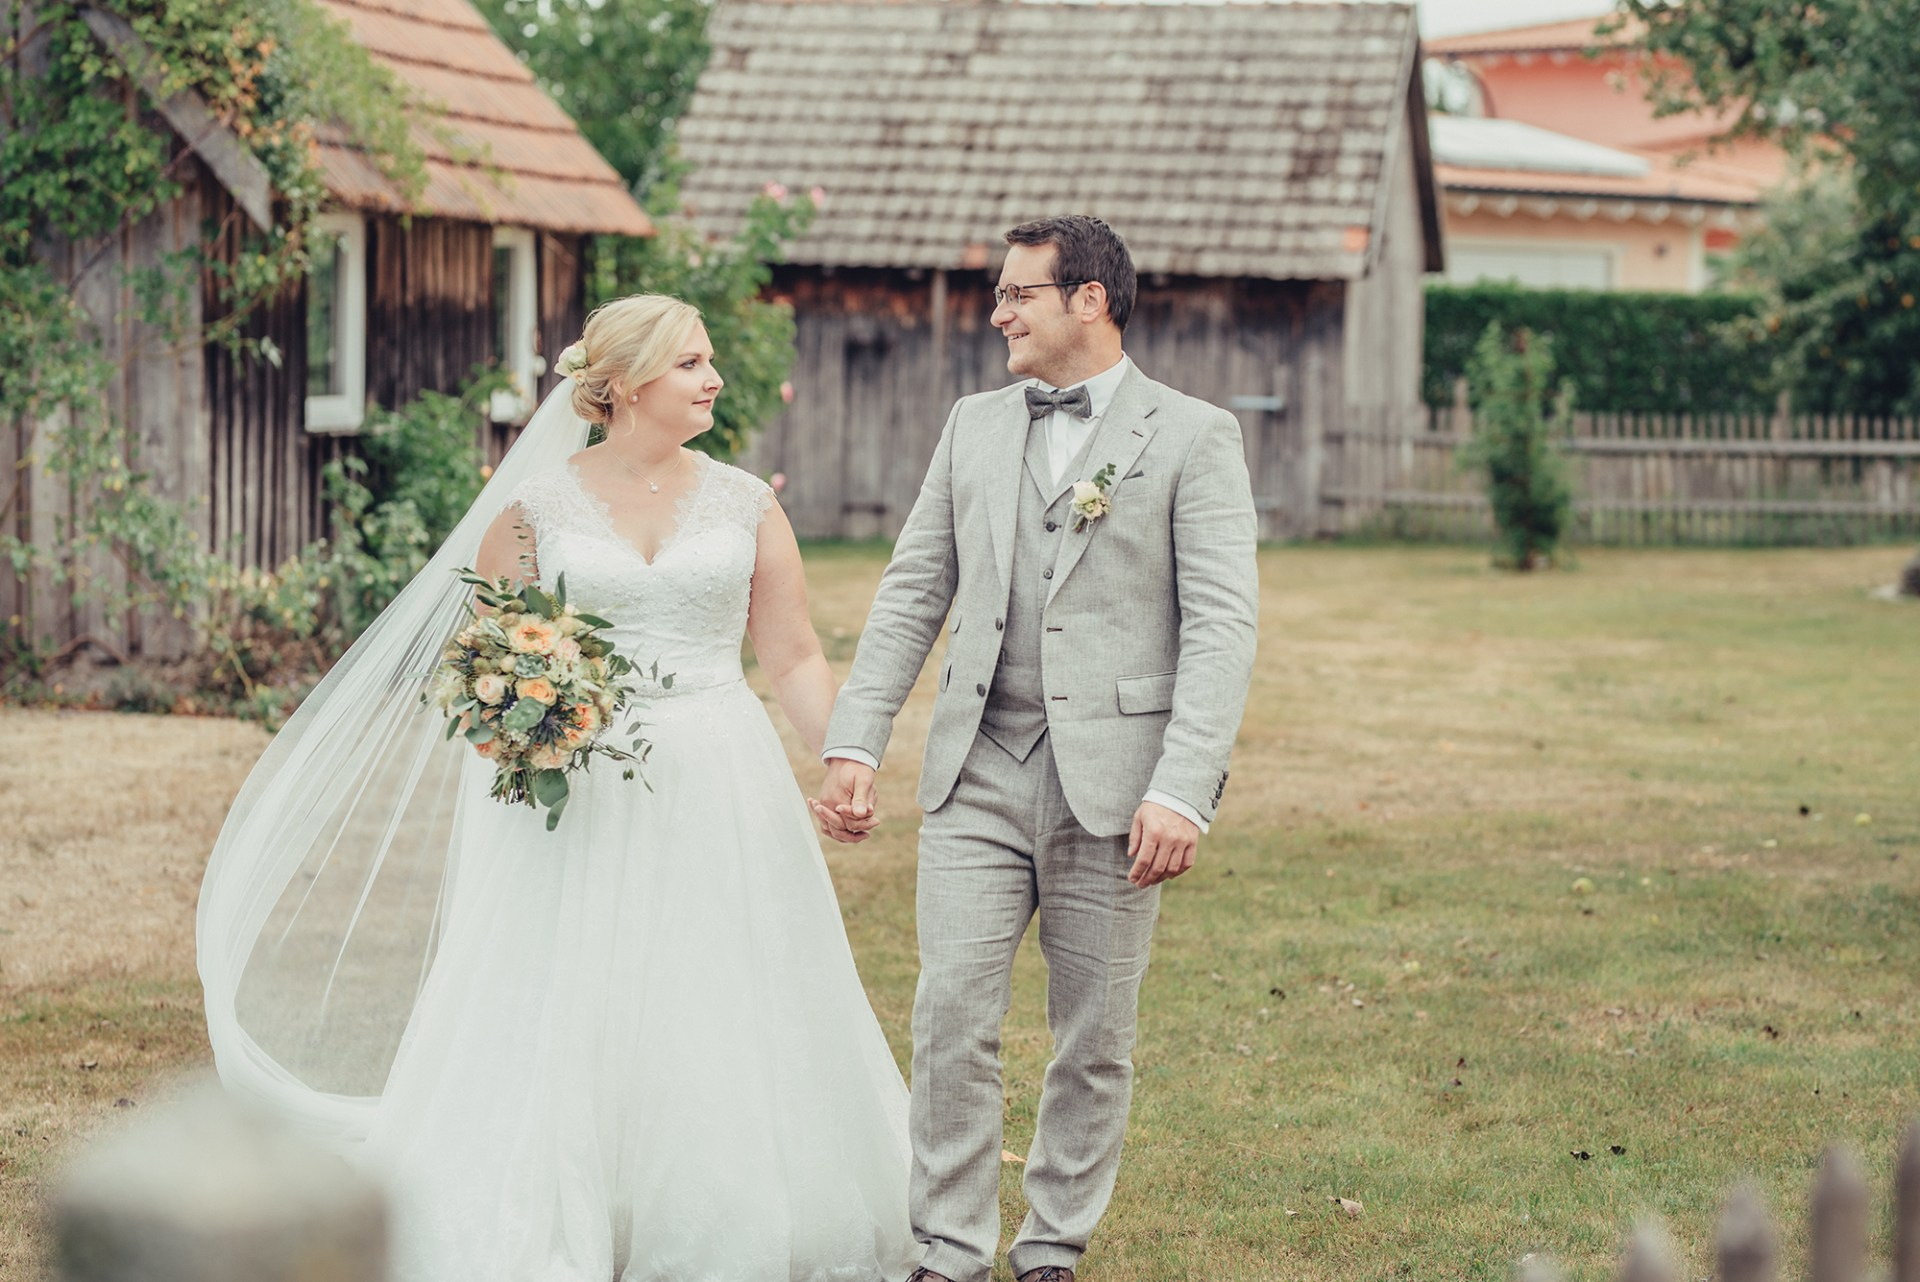 weddingseptemberluminoxx92348234147